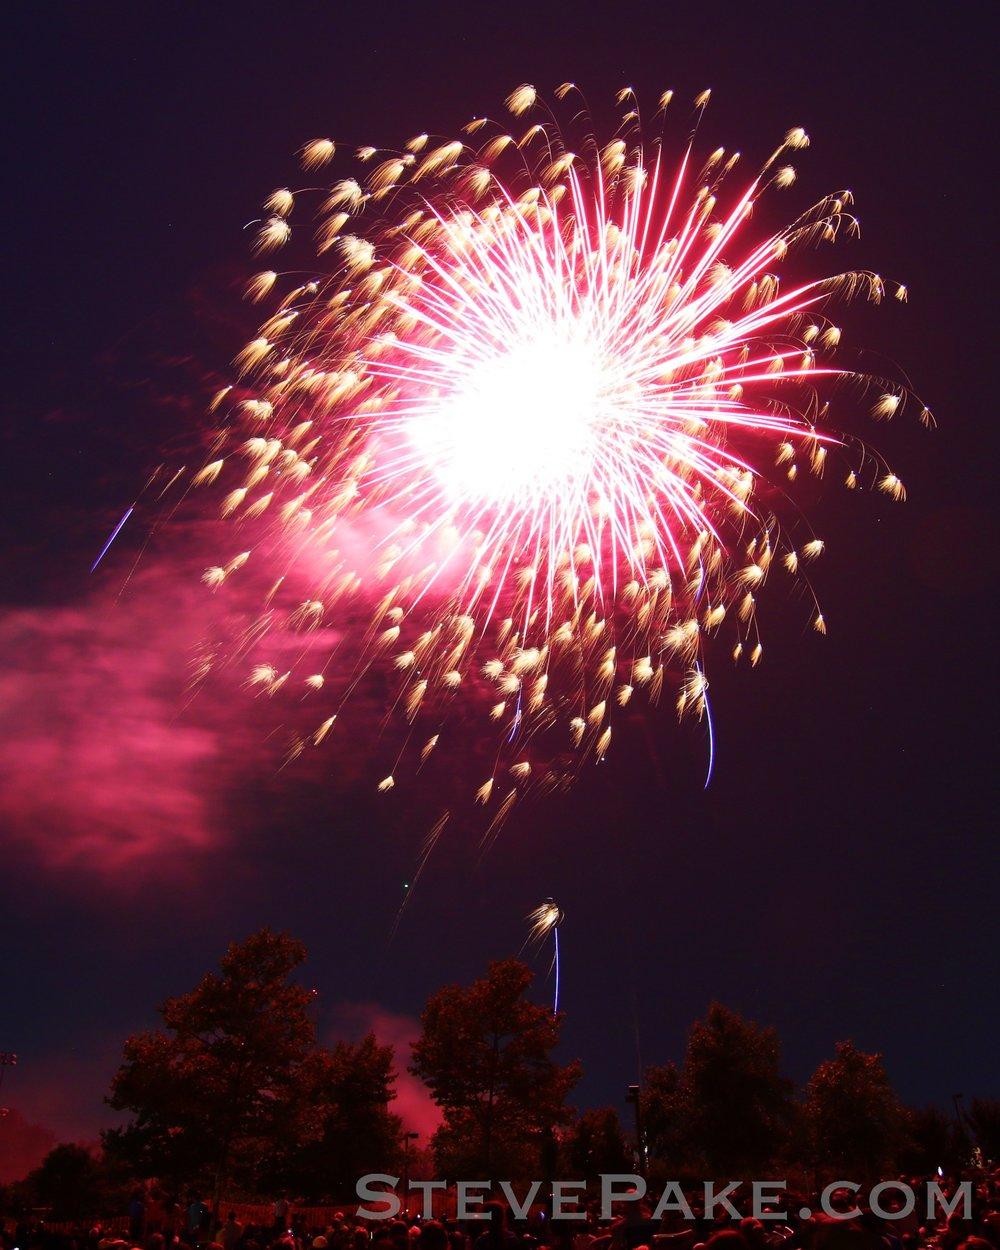 Fireworks2018_55_GE3A8605vap-HD-WM.jpg